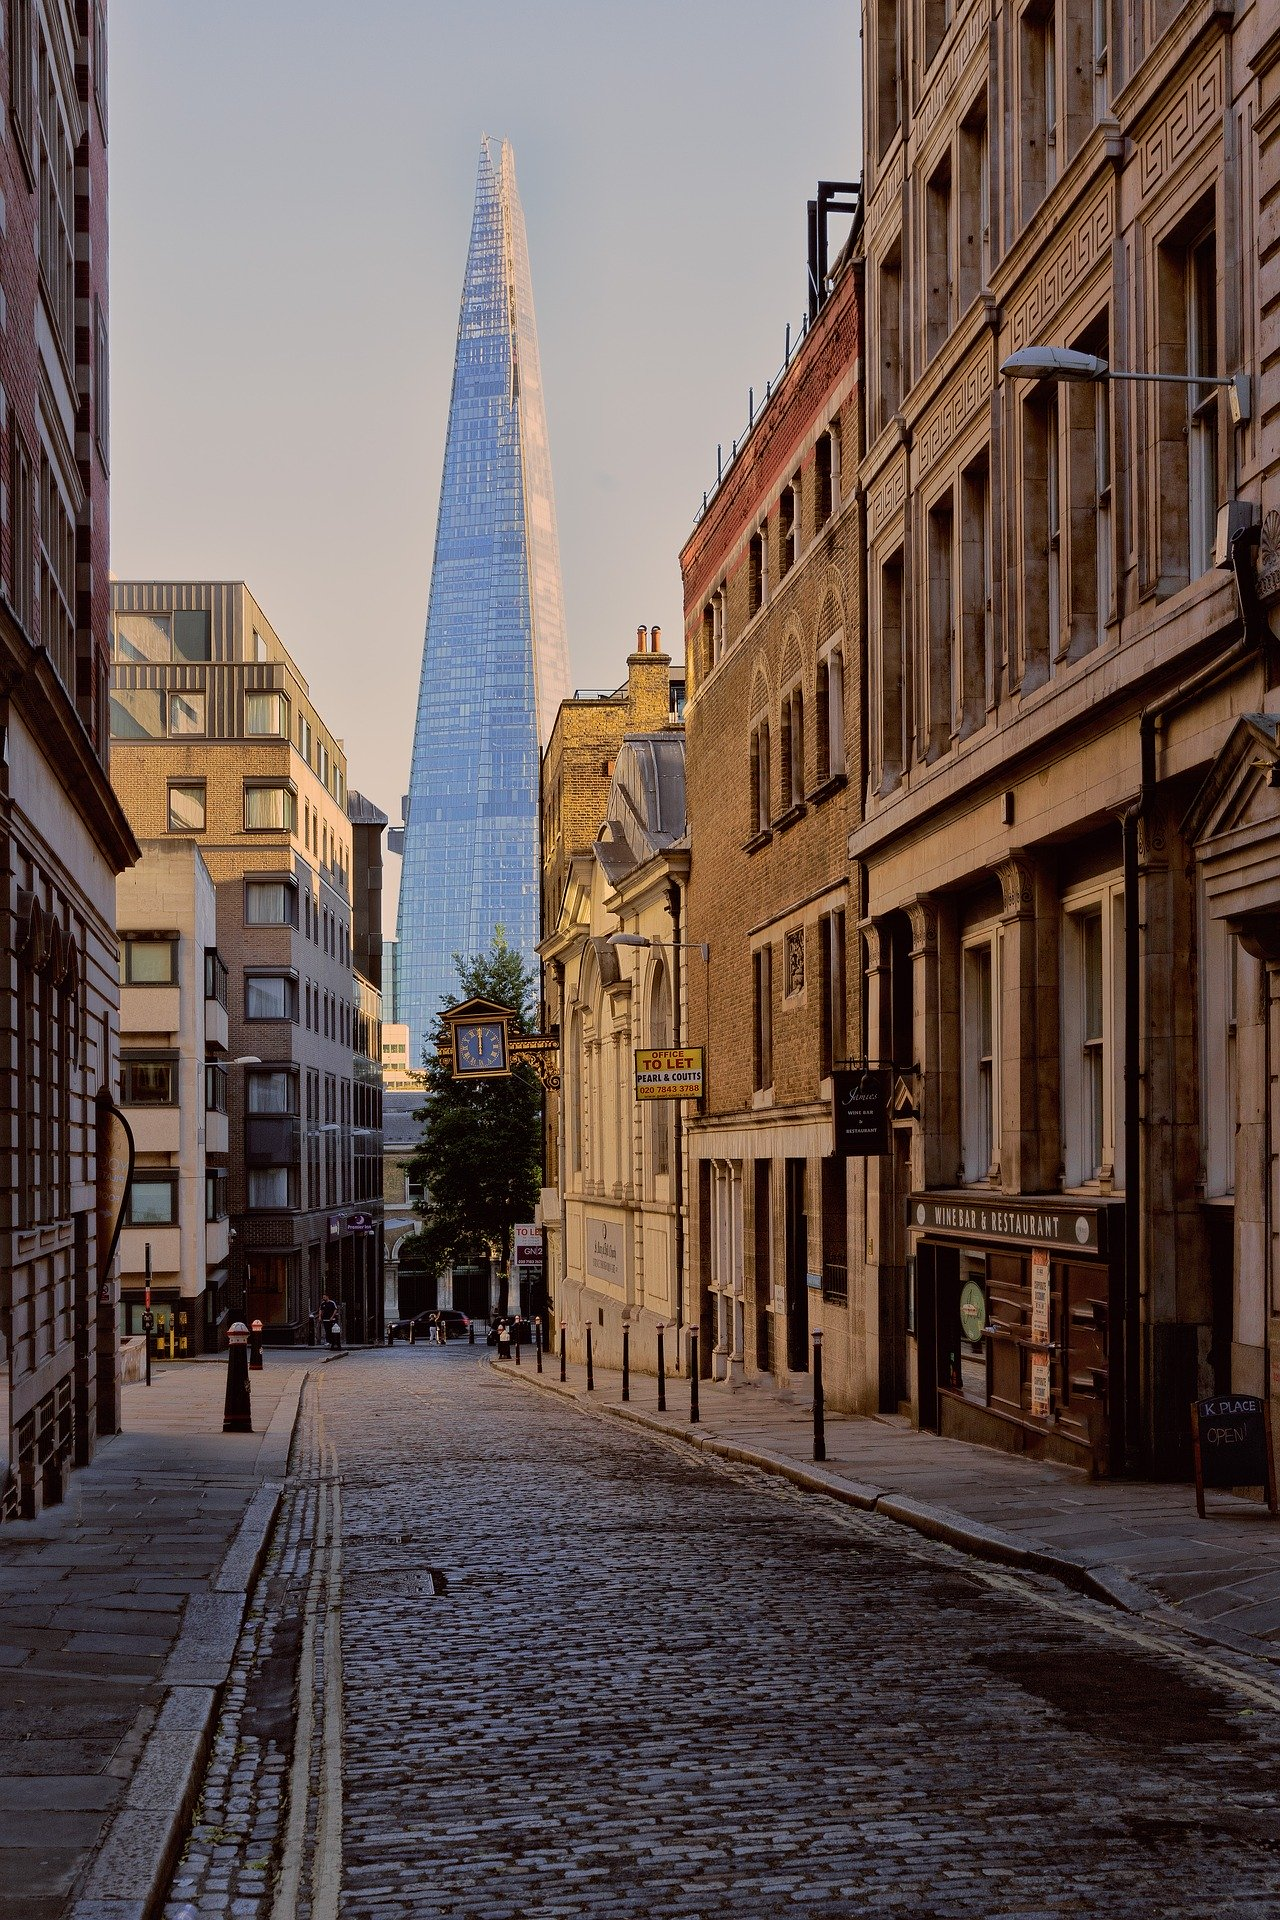 london in quarantine 1280x1920 - Free image bank